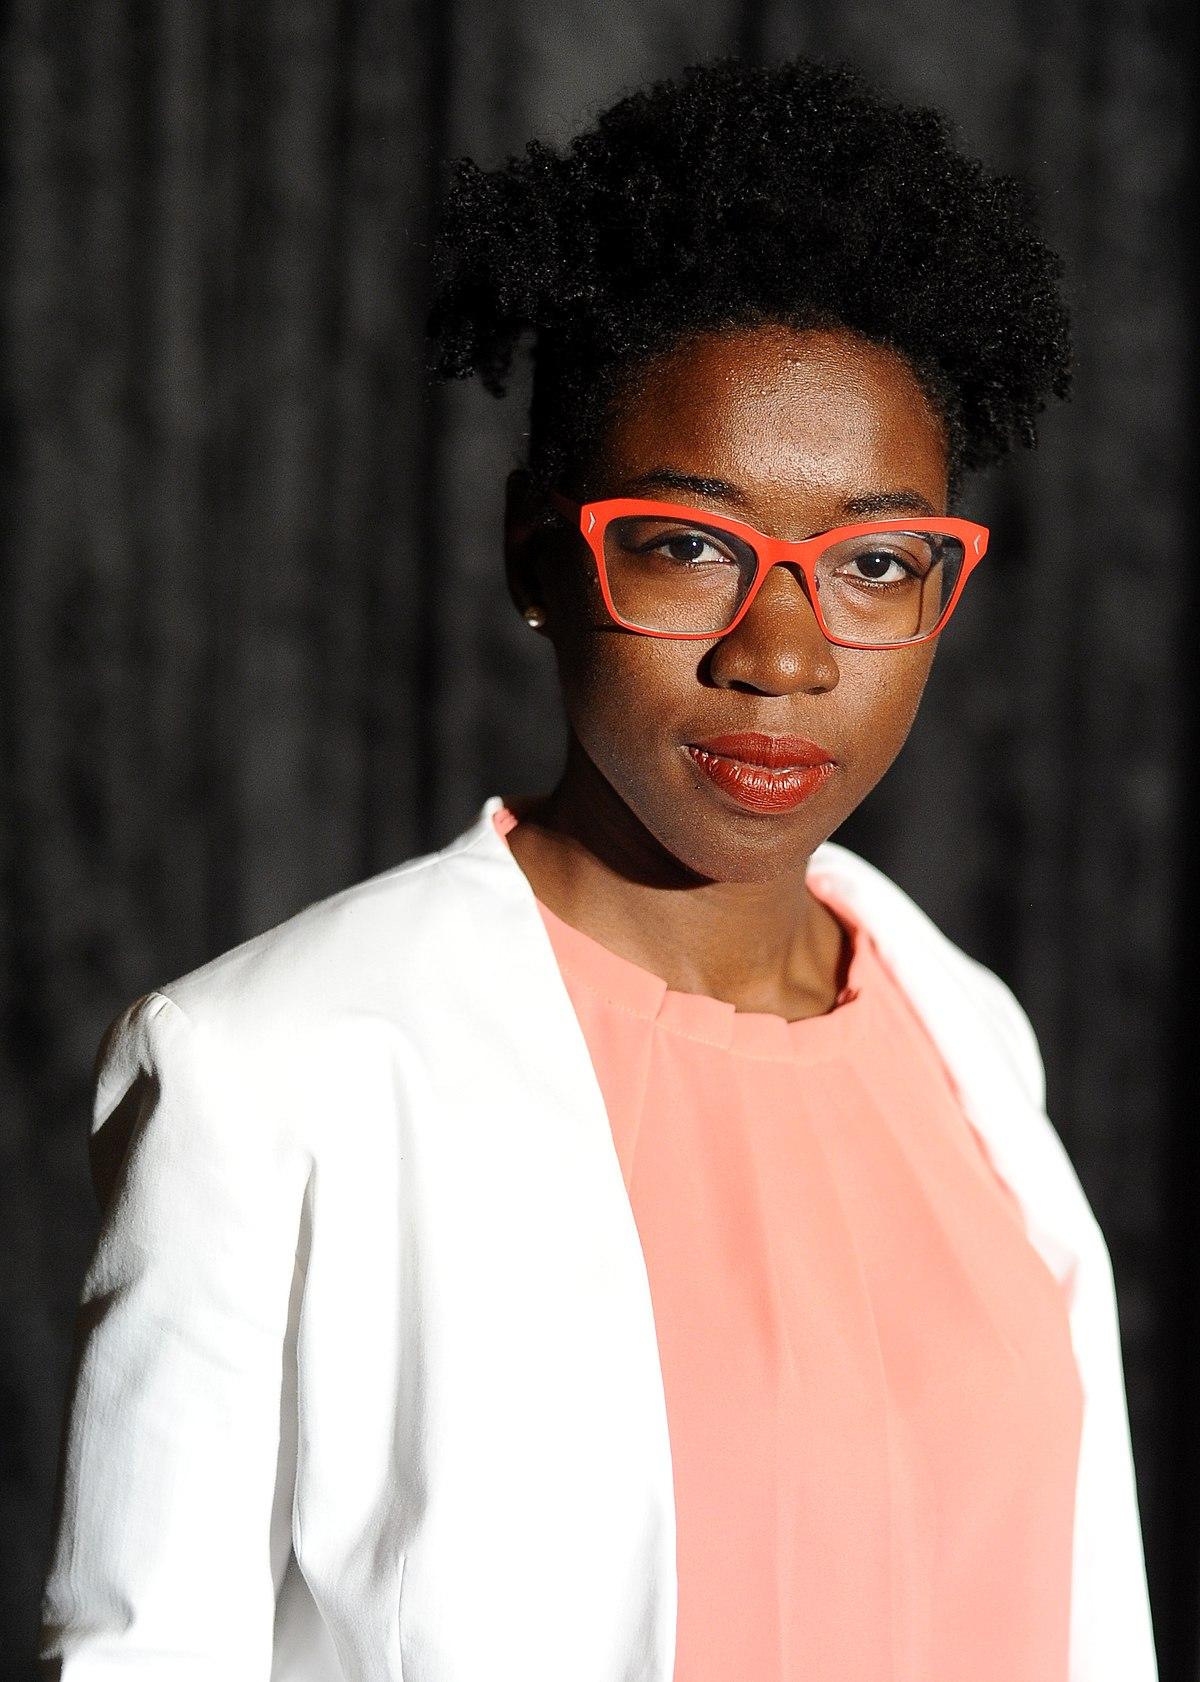 Joy Buolamwini - Wikipedia